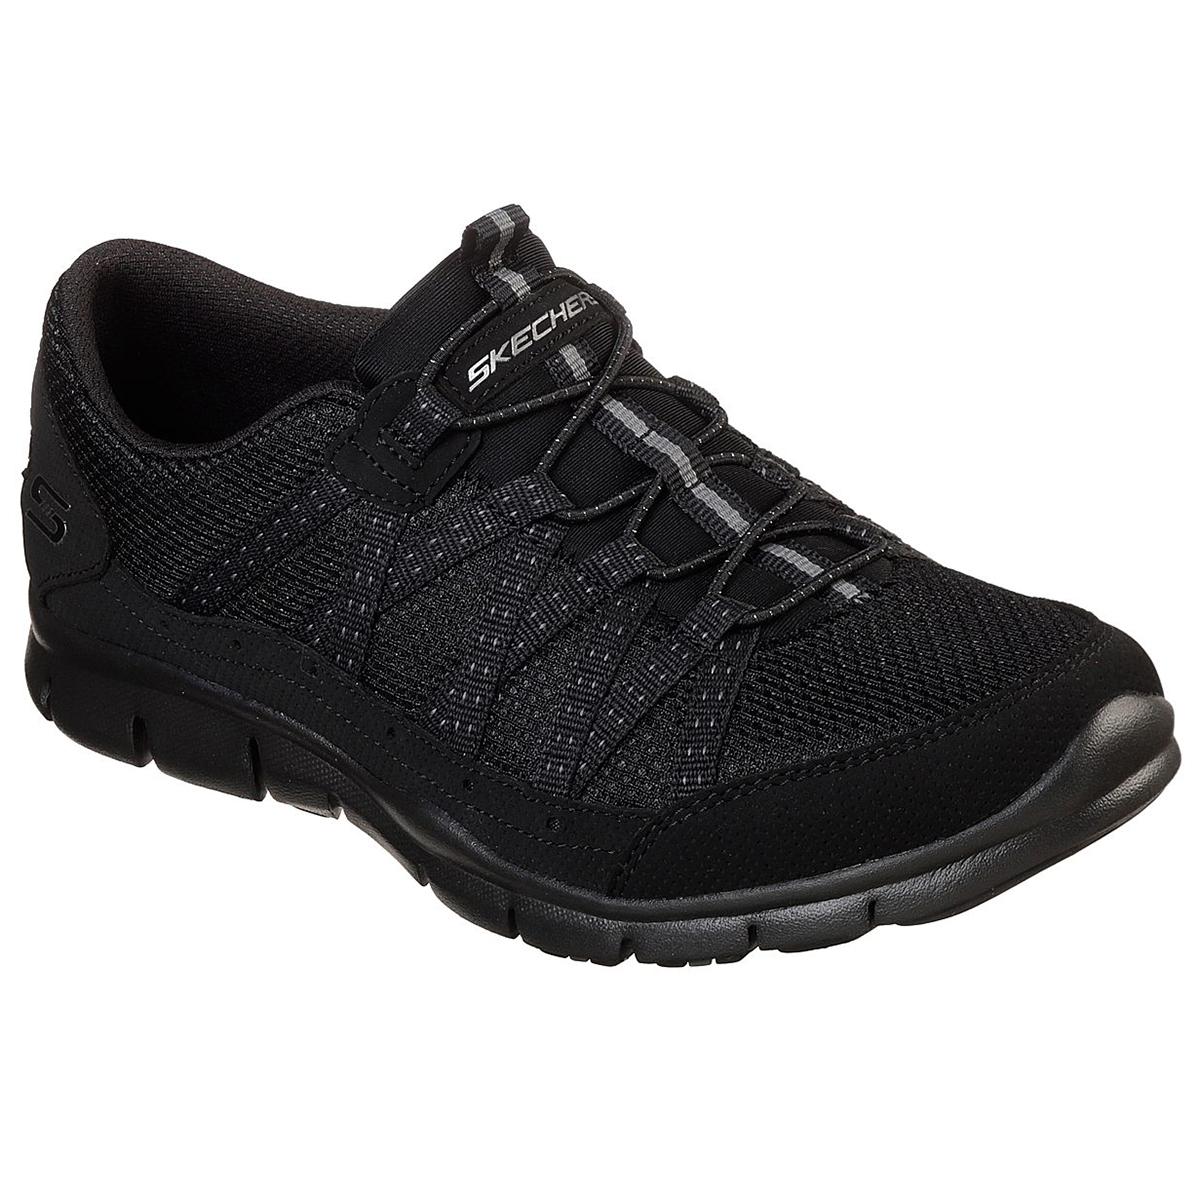 Skechers Women's Gratis Strolling Slip-On Sneakers - Black, 6